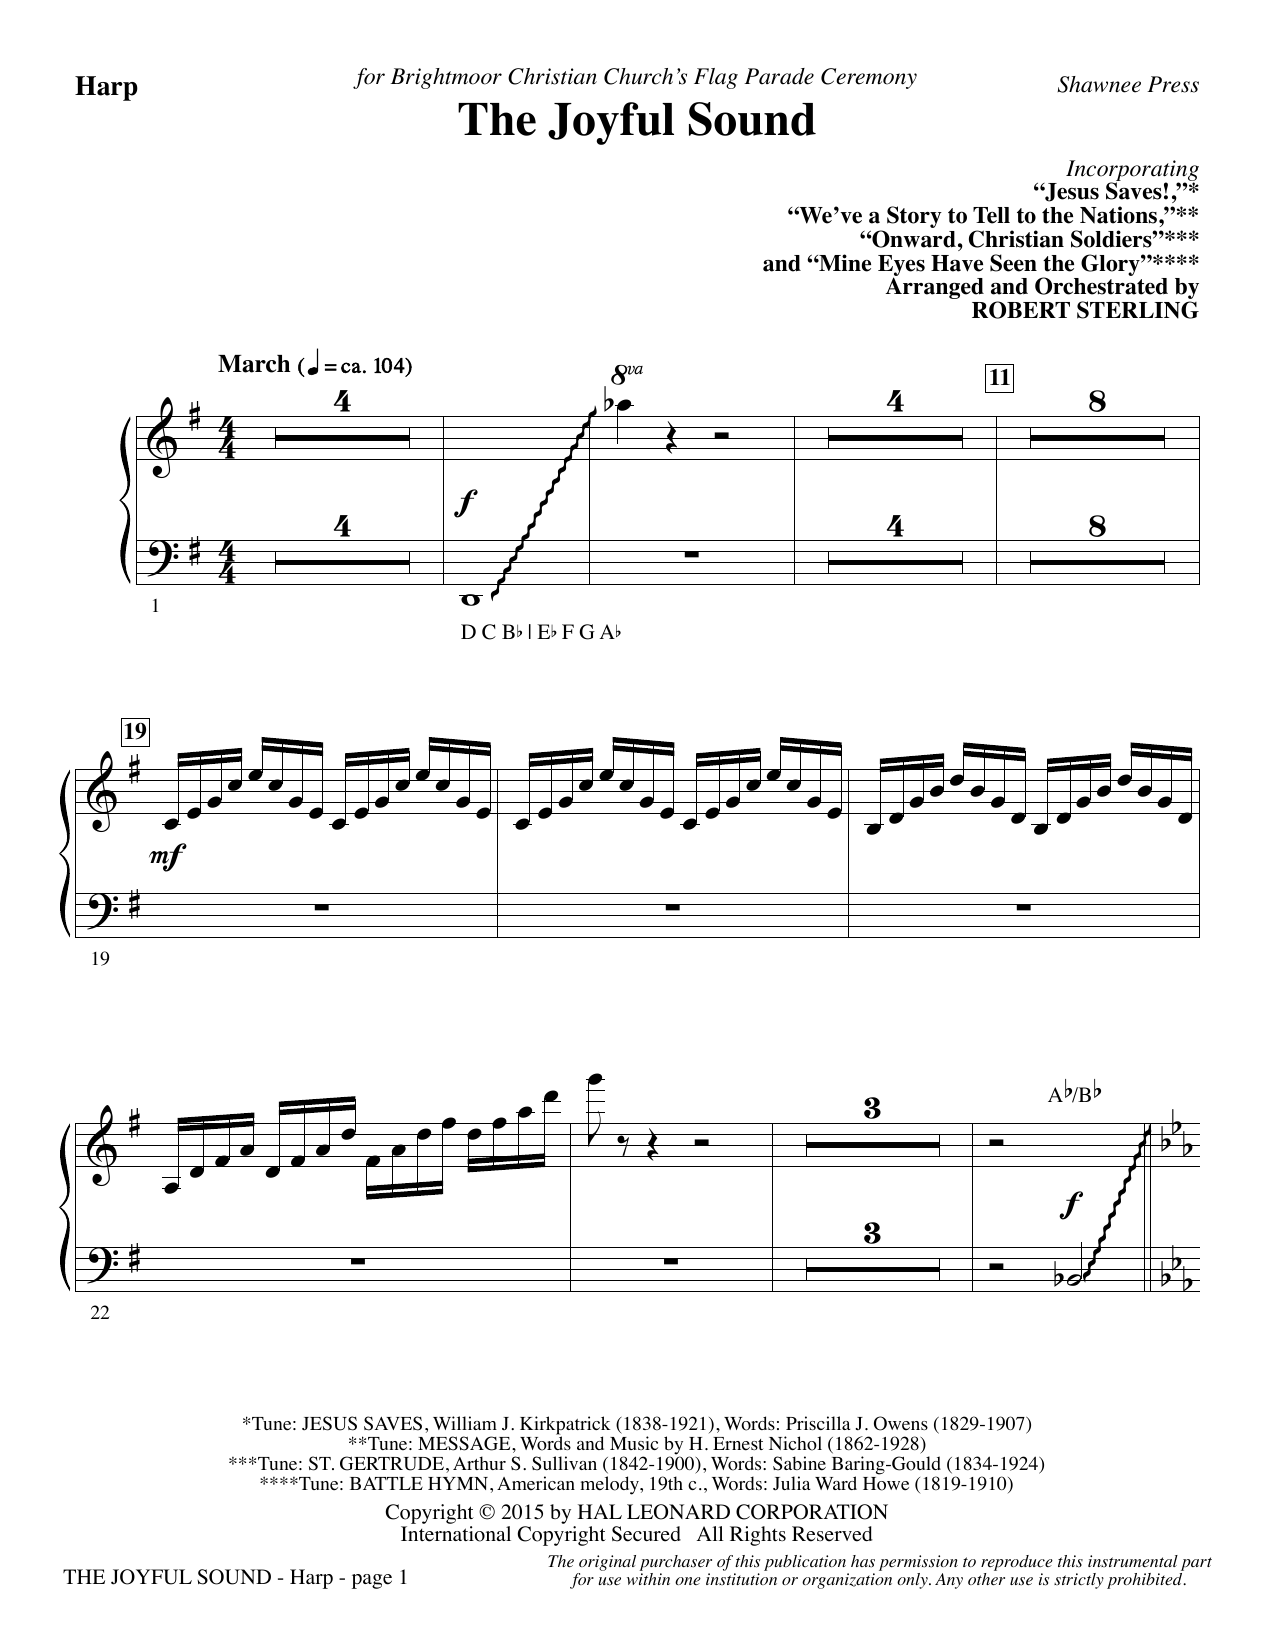 The Joyful Sound - Harp Sheet Music